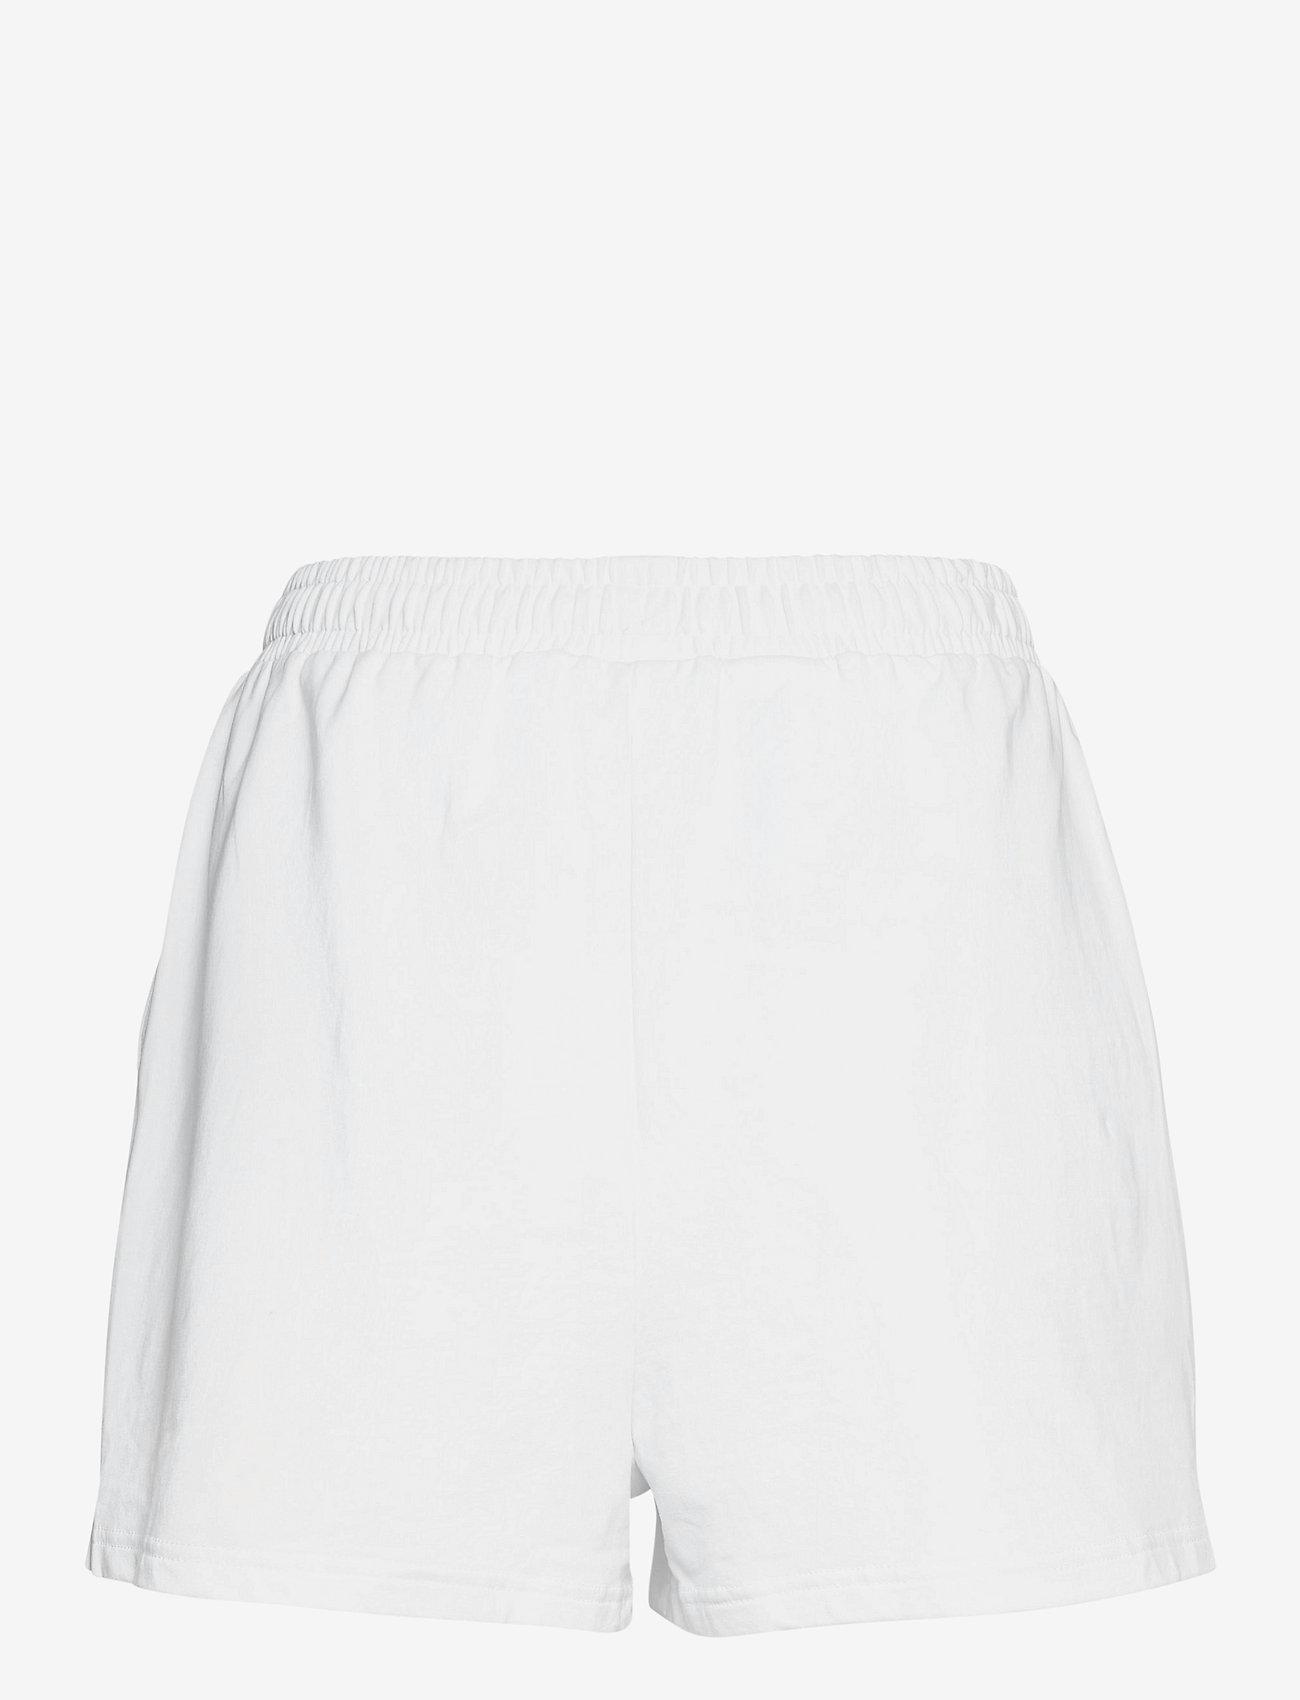 FILA - EDEL shorts high waist - chaussures de course - bright white - 1